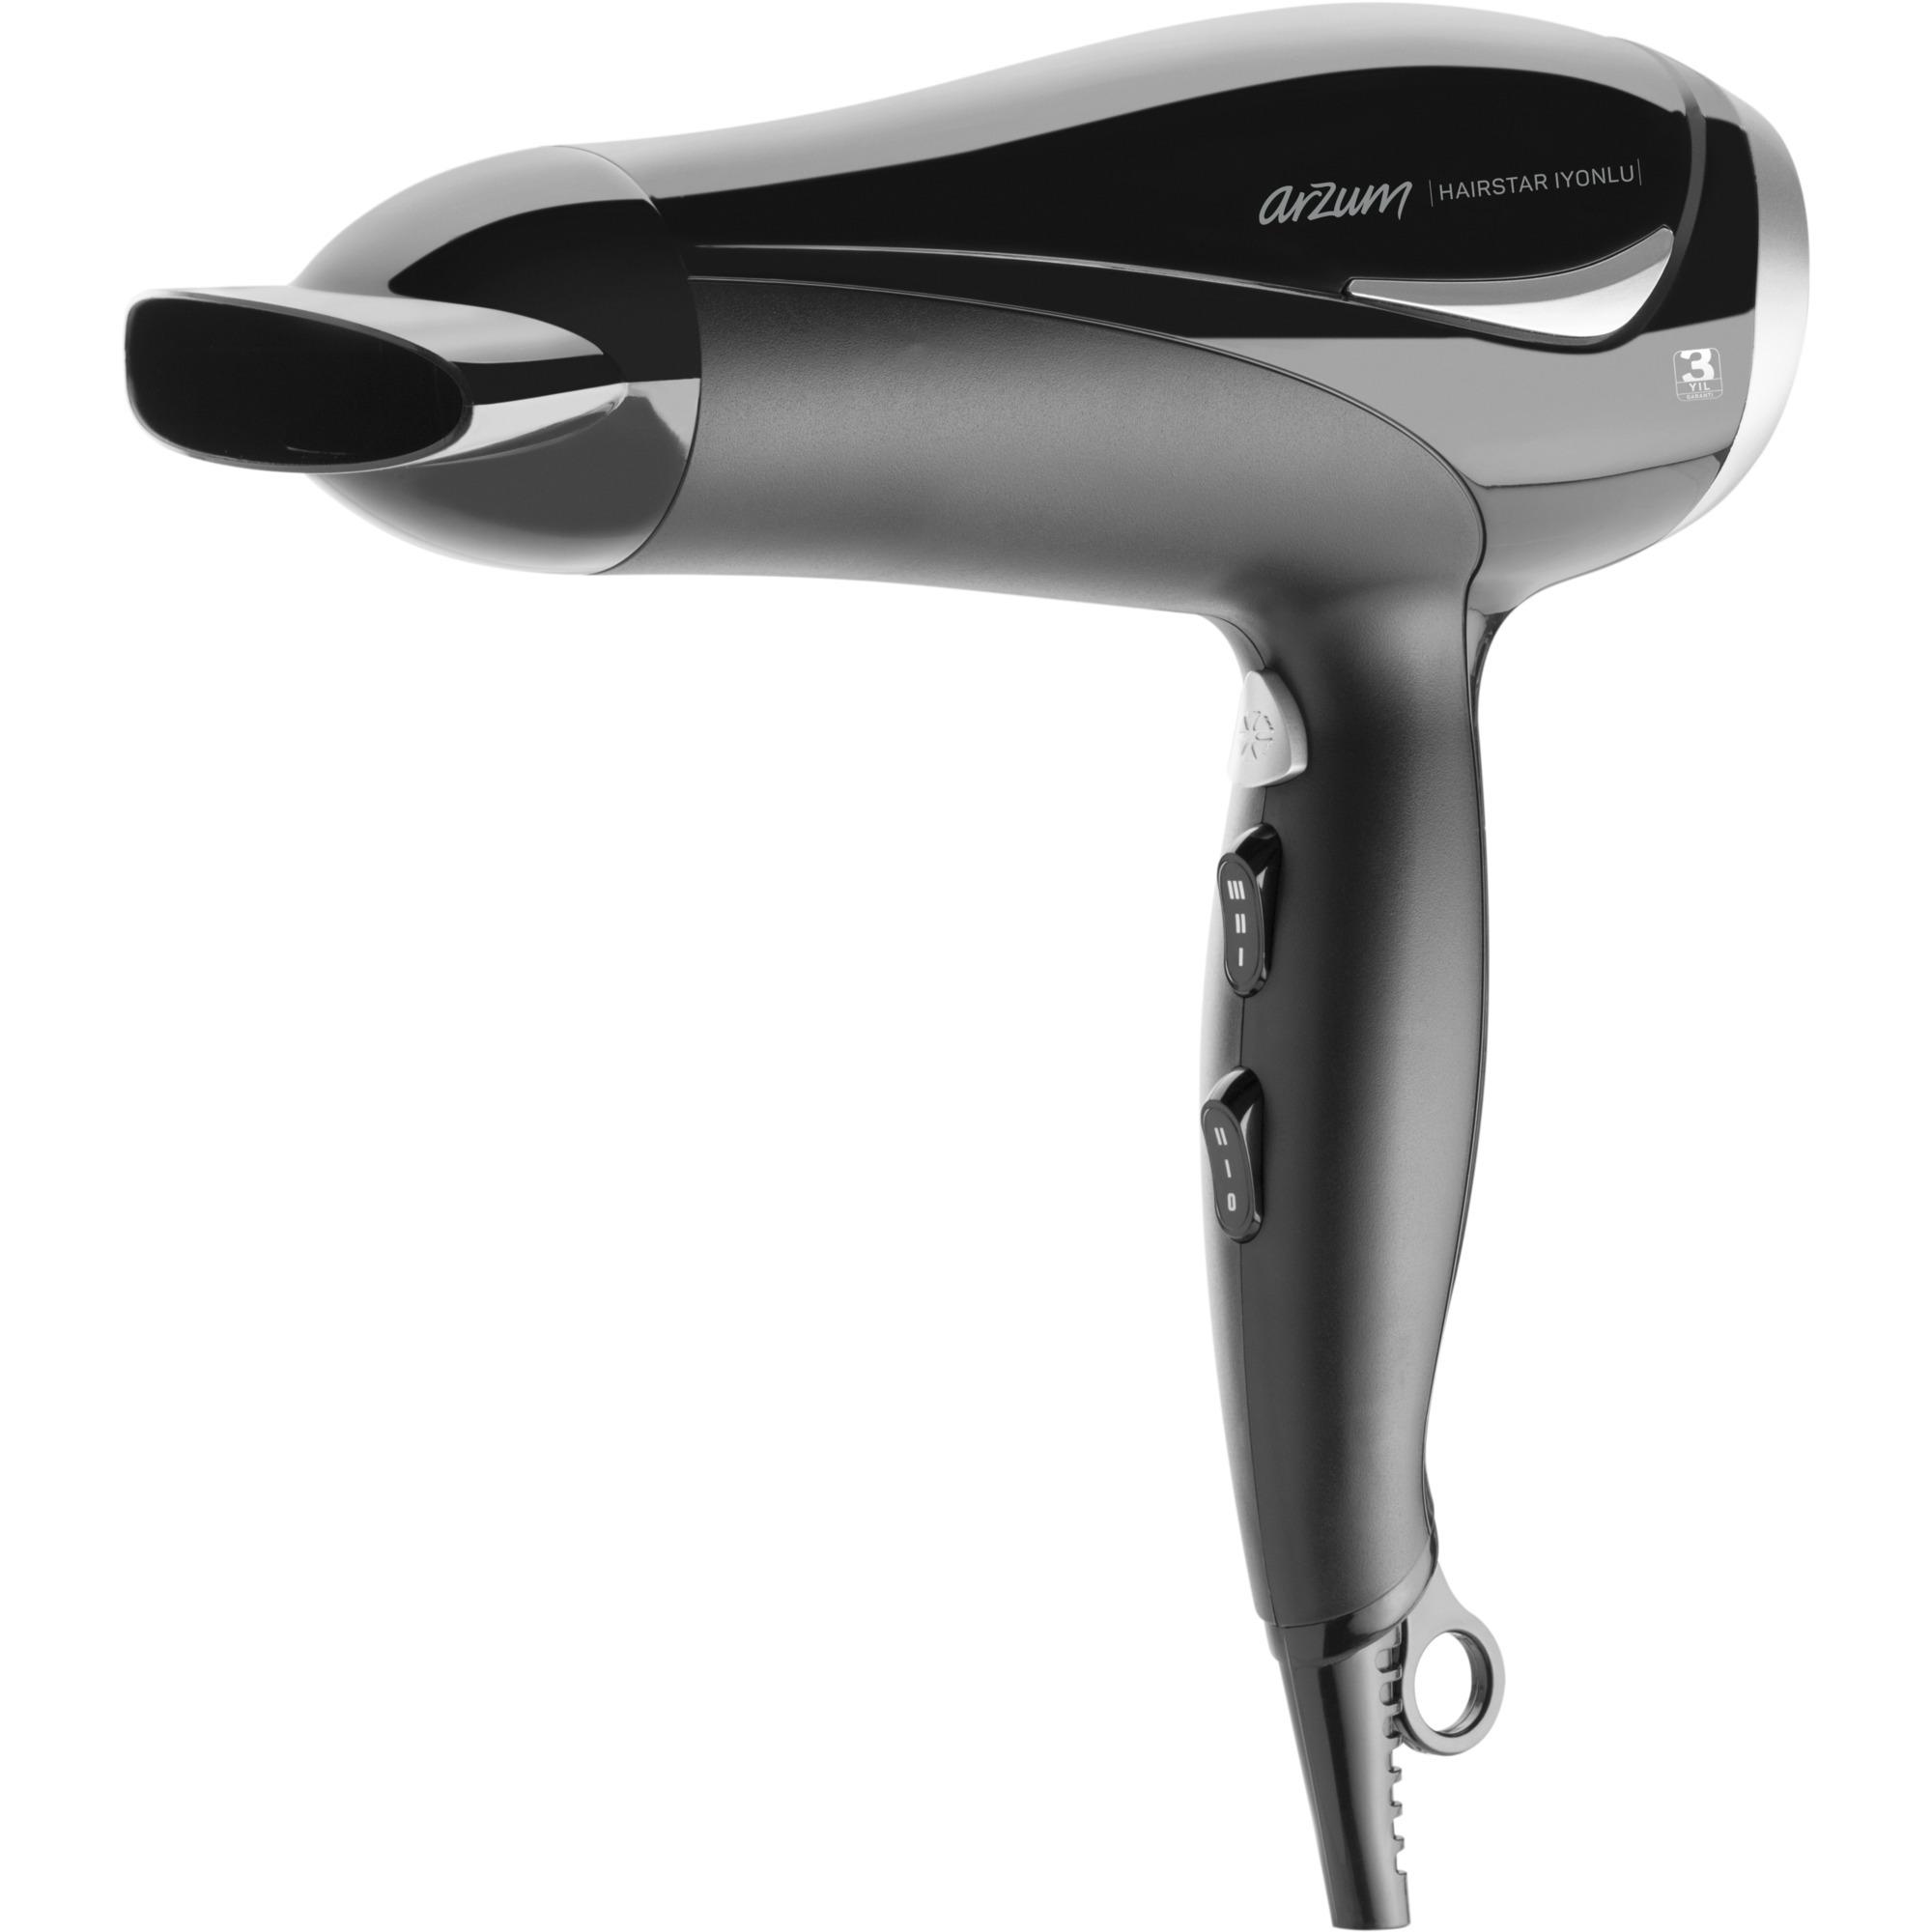 AR 576 Hairstar, Secador de pelo